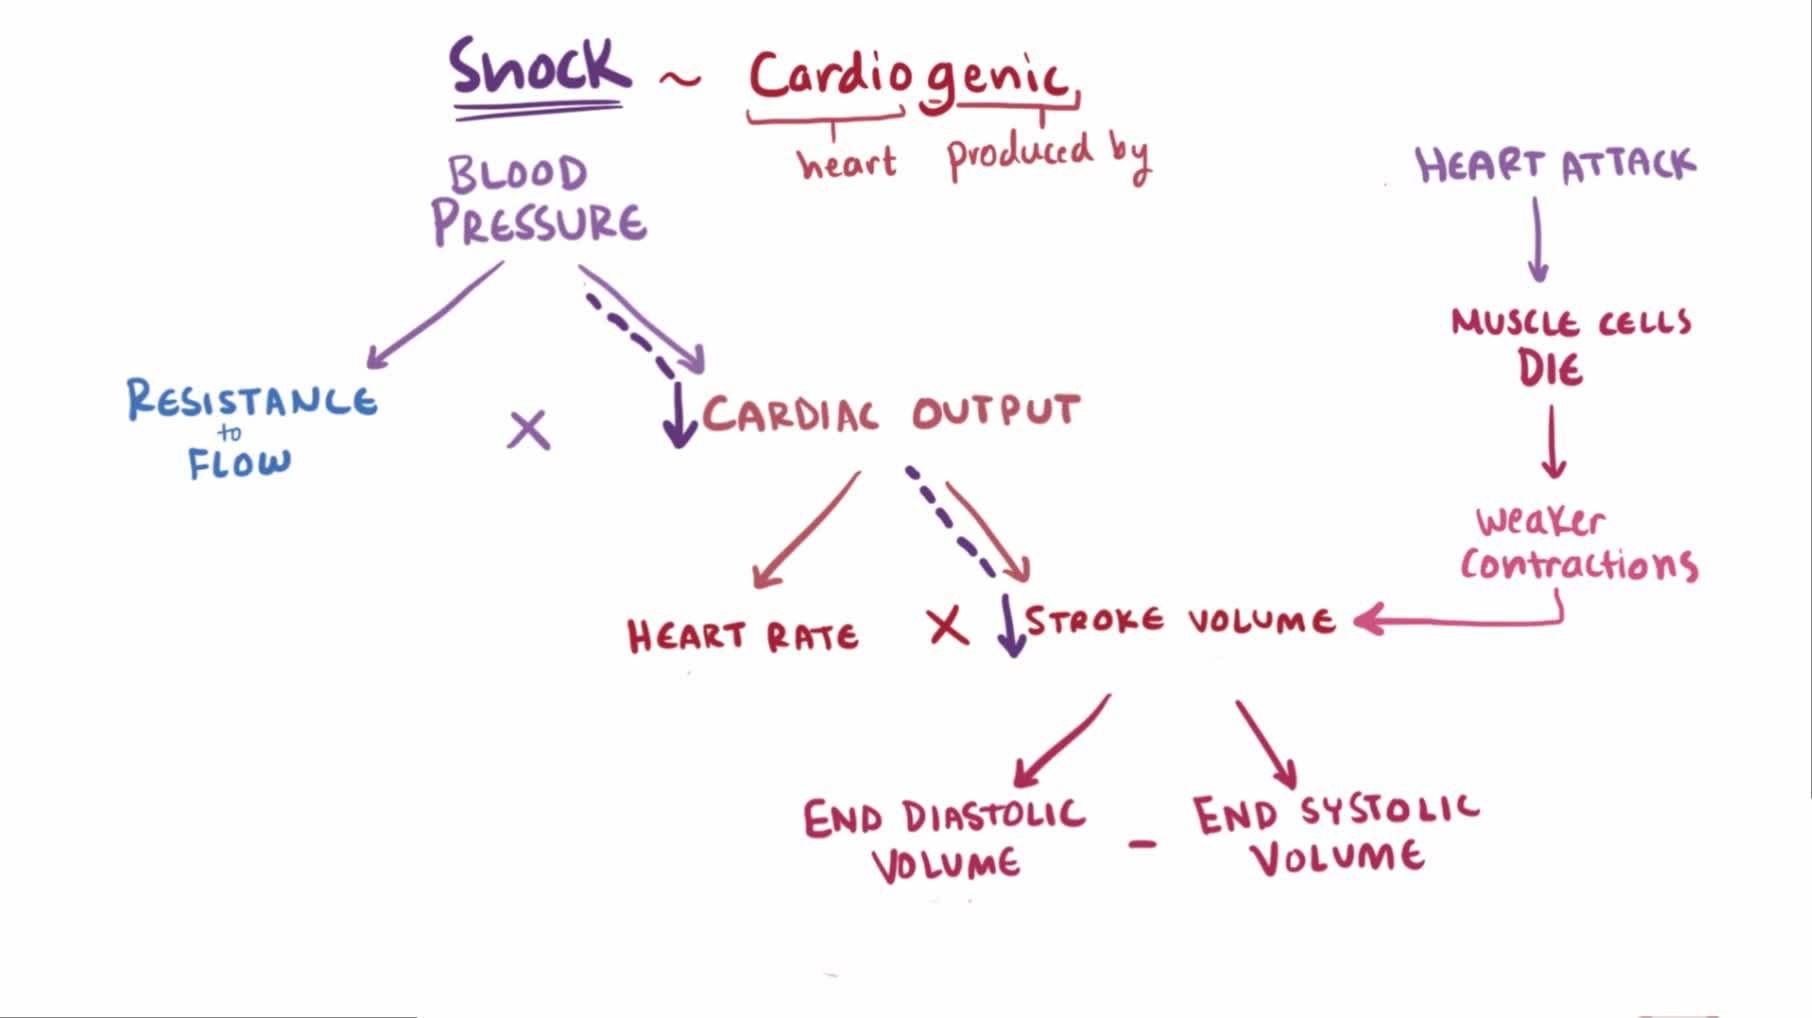 Shock Circulatory